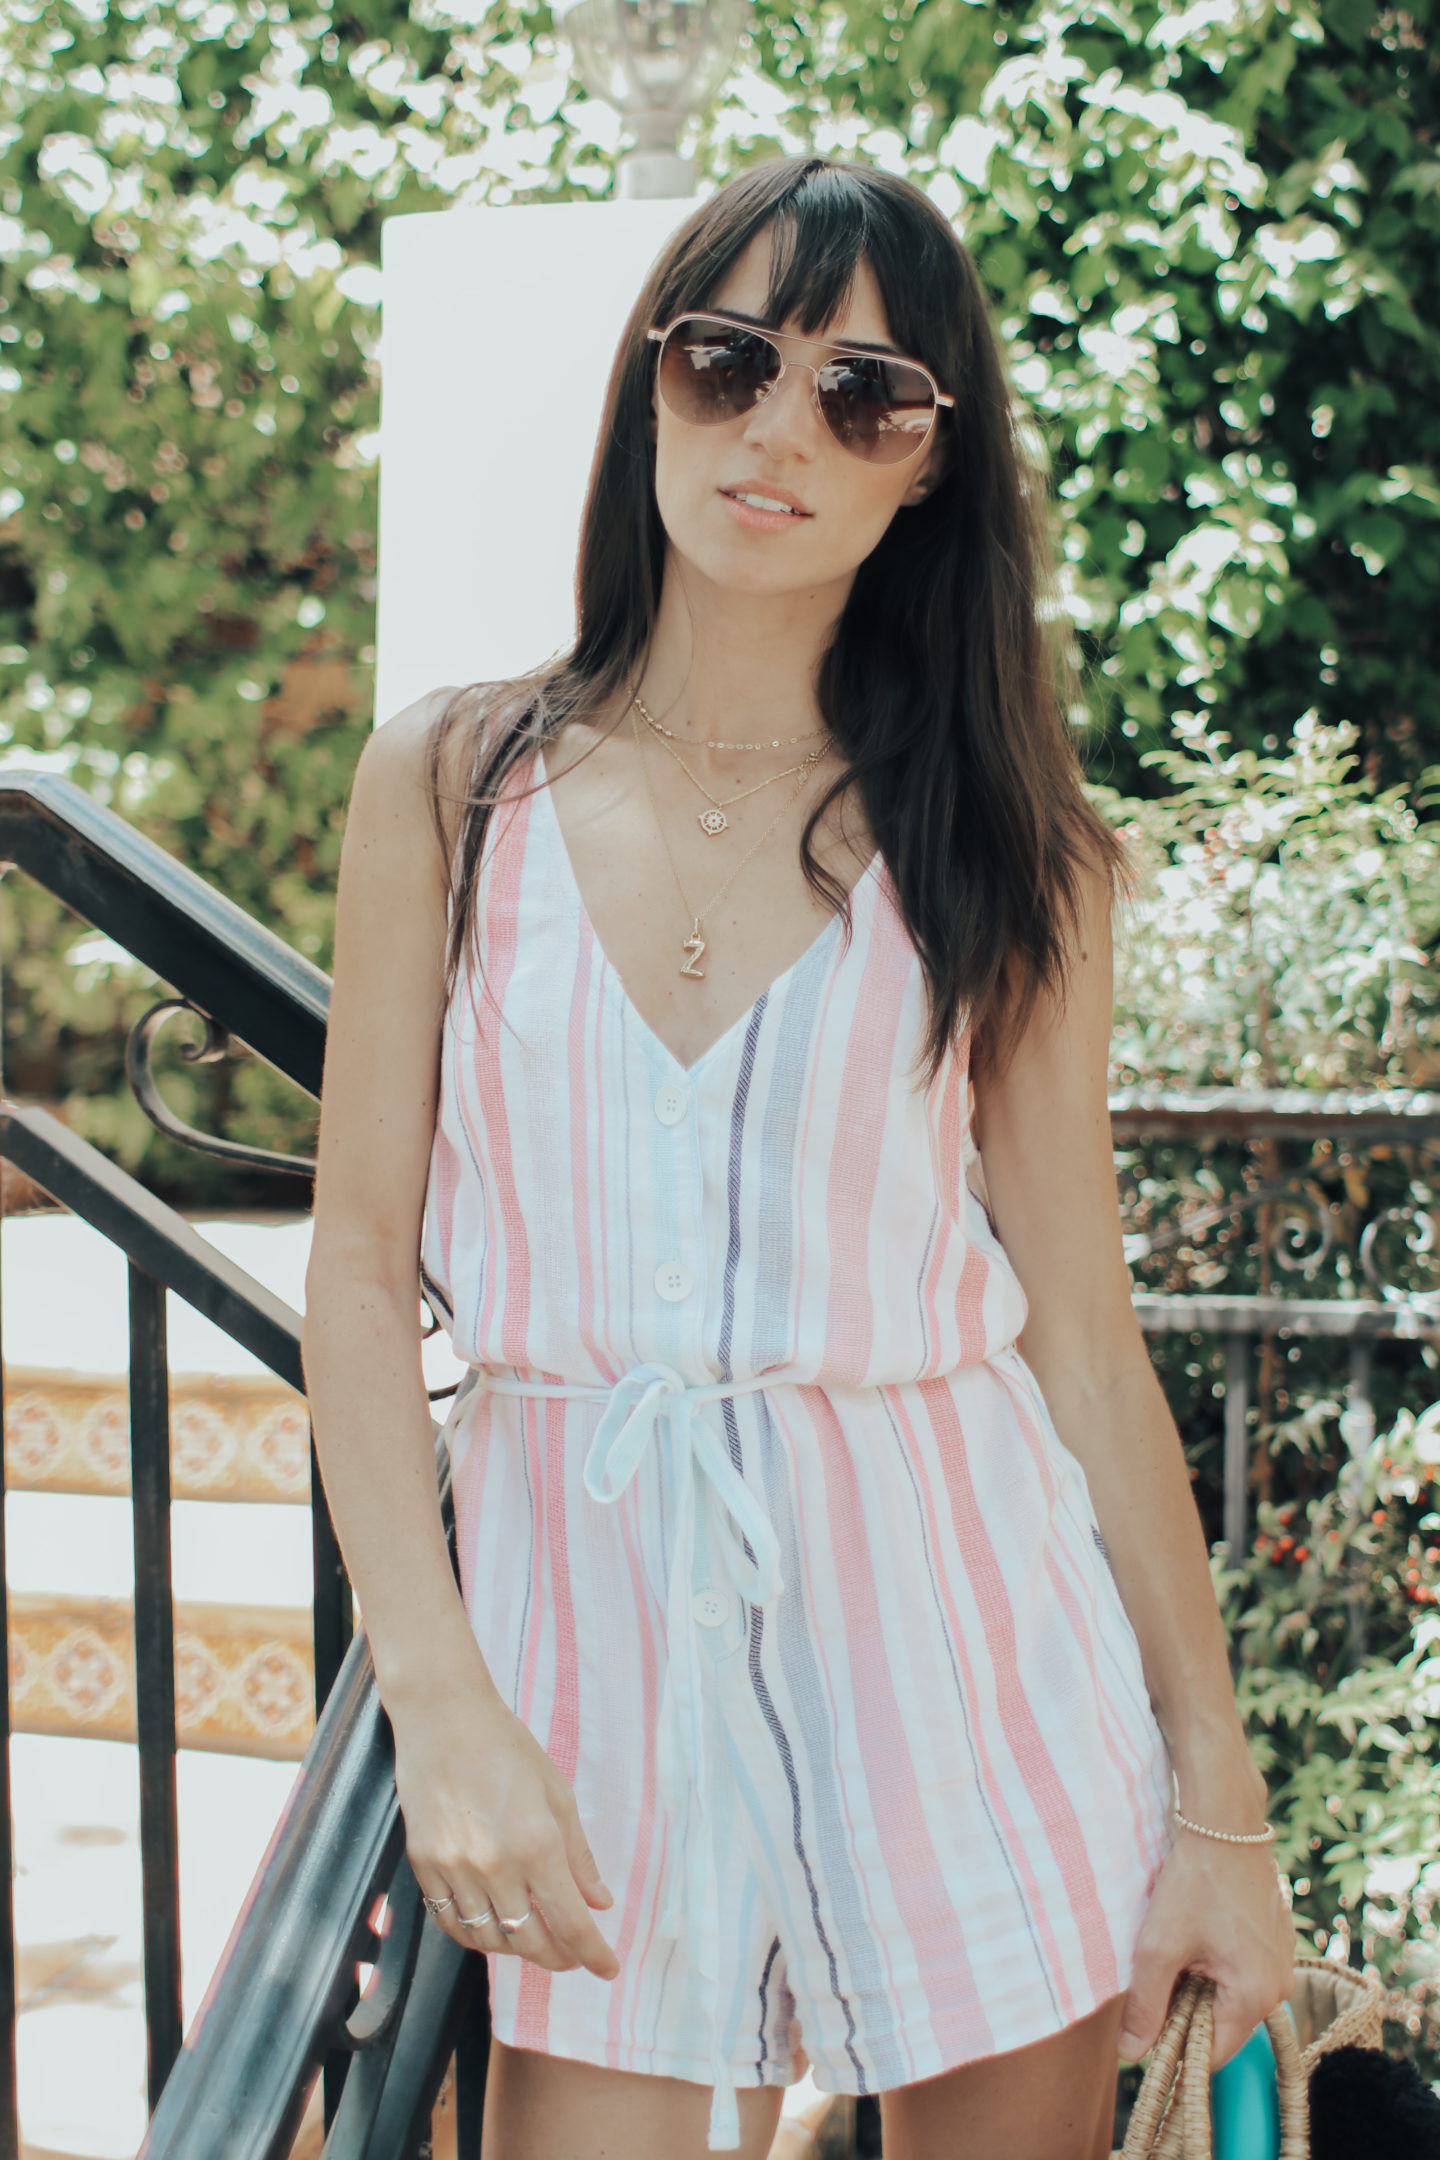 Babbleboxx - Zenni Rose Gold Aviator Sunglasses Fashion - thecasualfree.com